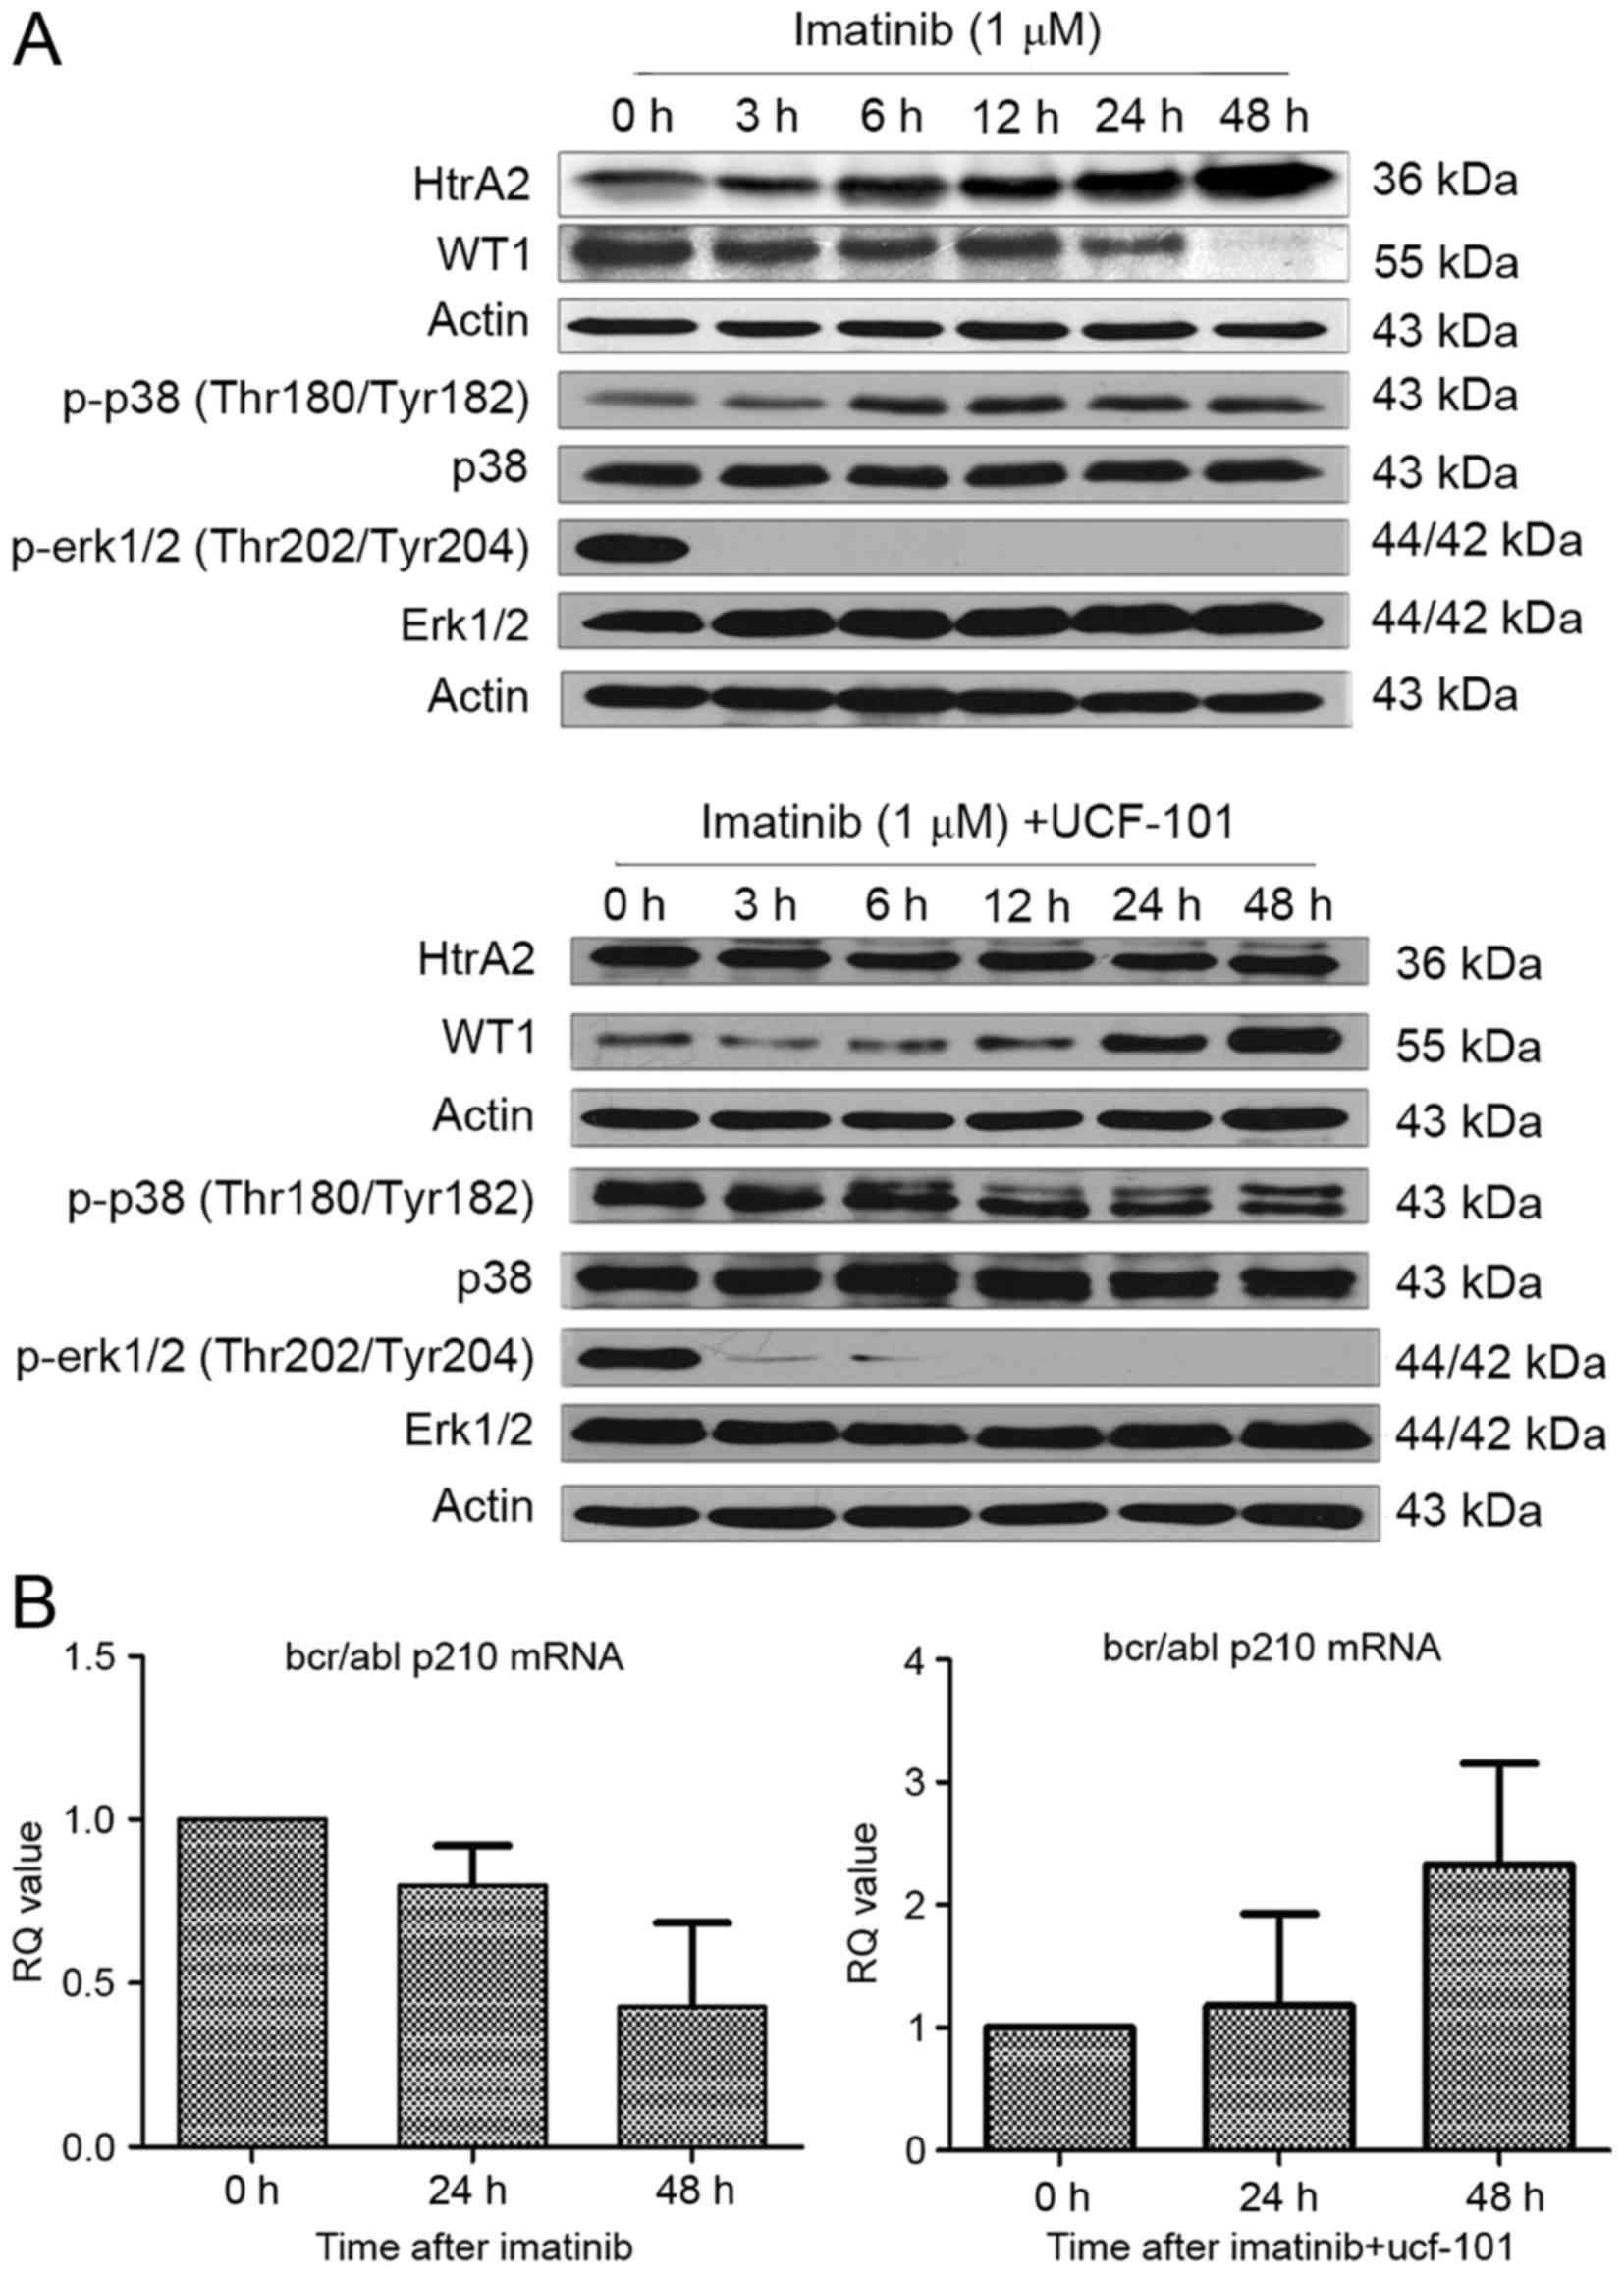 Regulation of HtrA2 on WT1 gene expression under imatinib